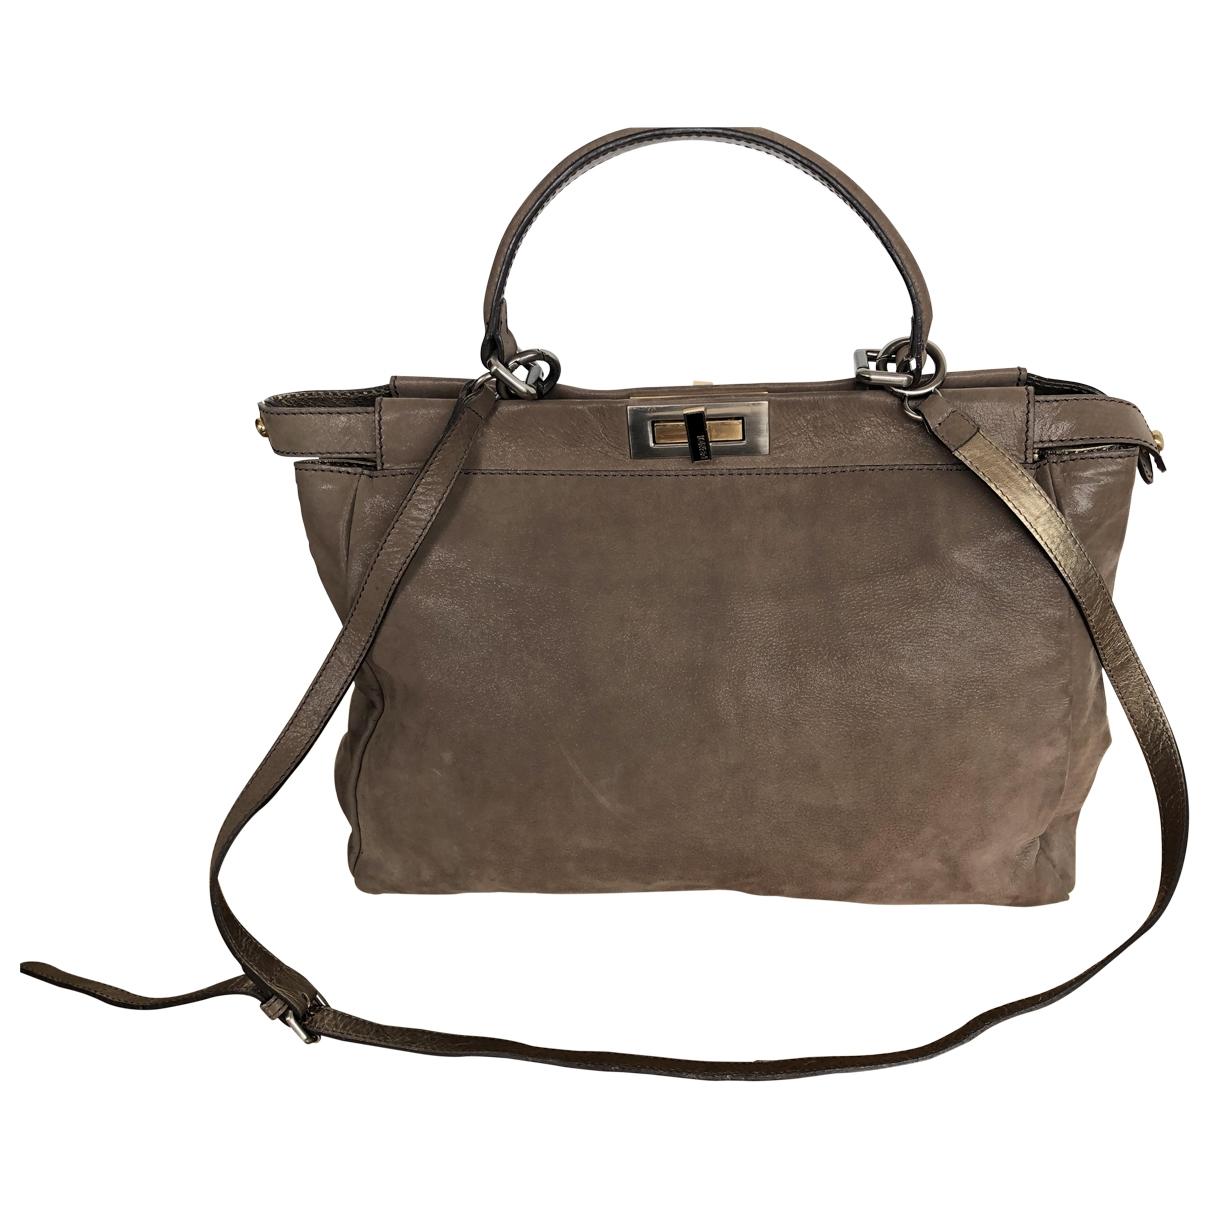 Fendi Peekaboo Beige Suede handbag for Women \N